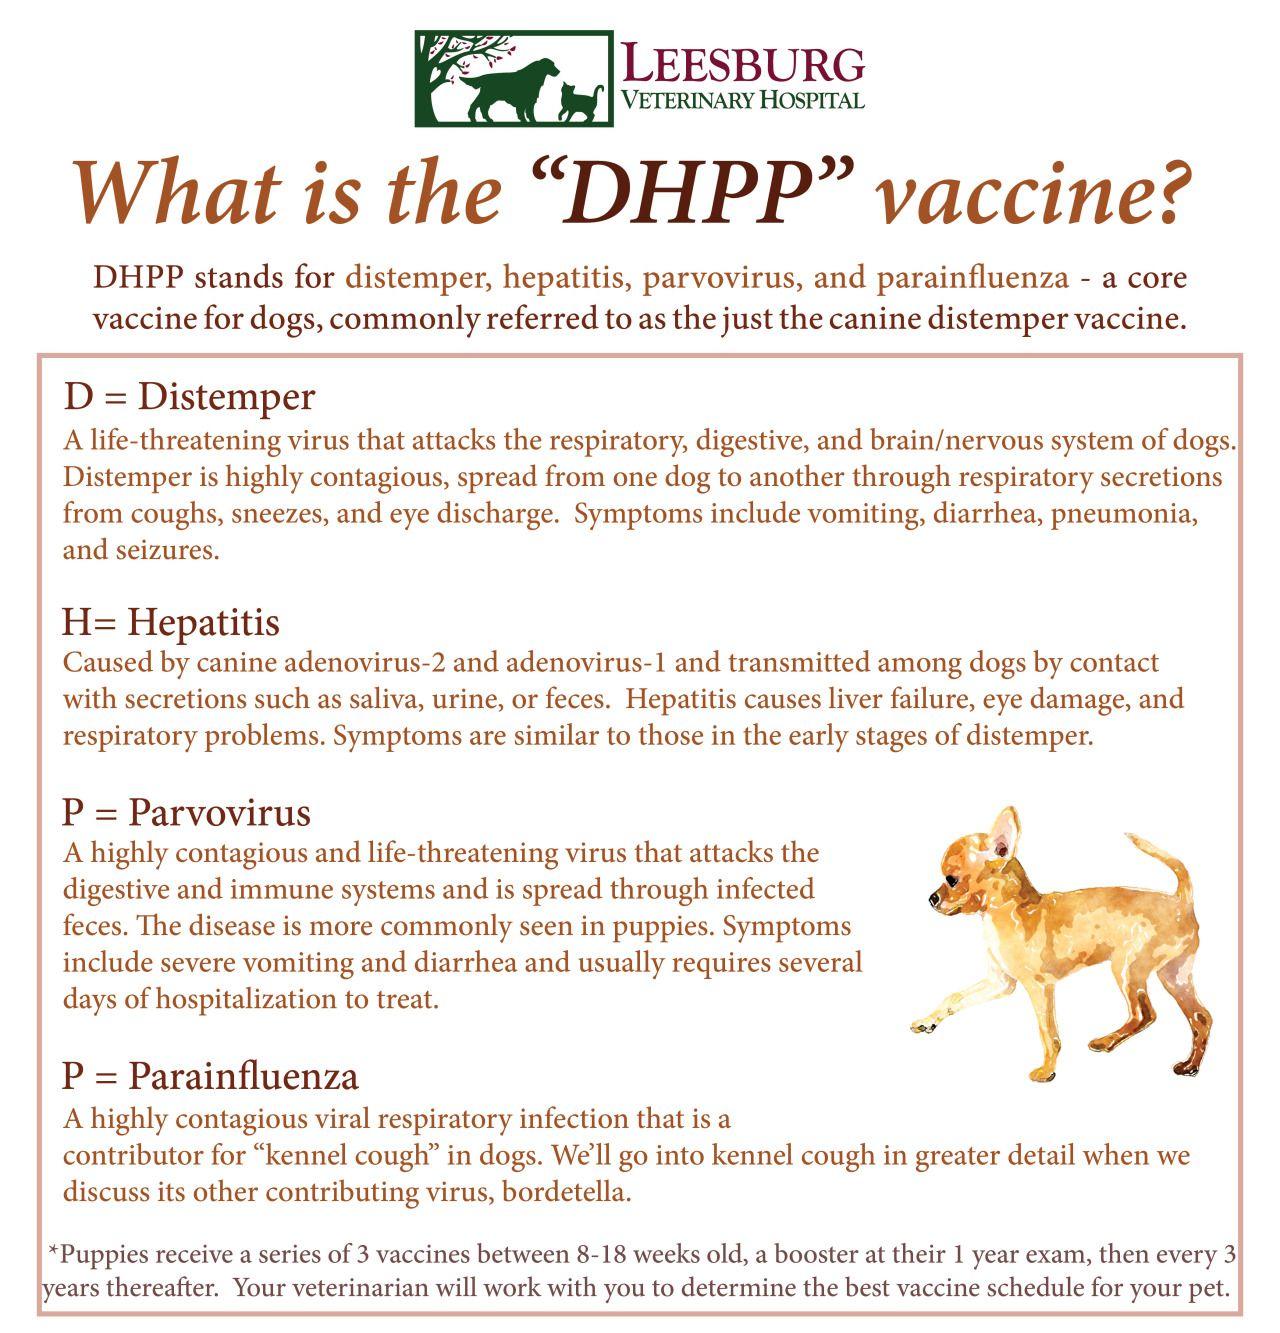 canine distemper dhpp vaccine